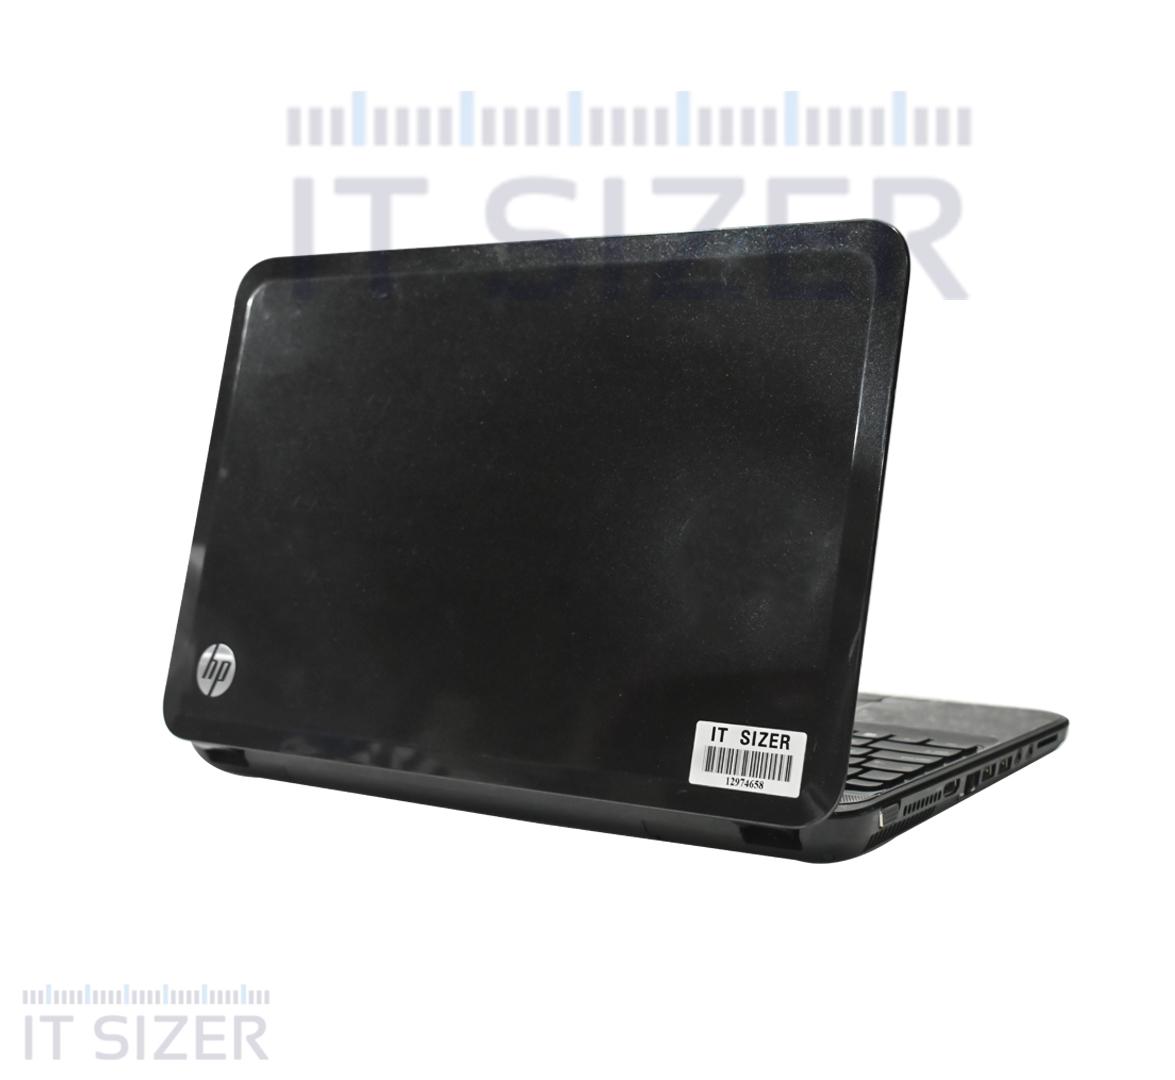 HP Pavilion G6 Business Laptop, AMD A6 CPU, 4GB DDR3L SODIMM RAM, 320GB SATA 2.5 Hard, 15 inch Display (Renewed)